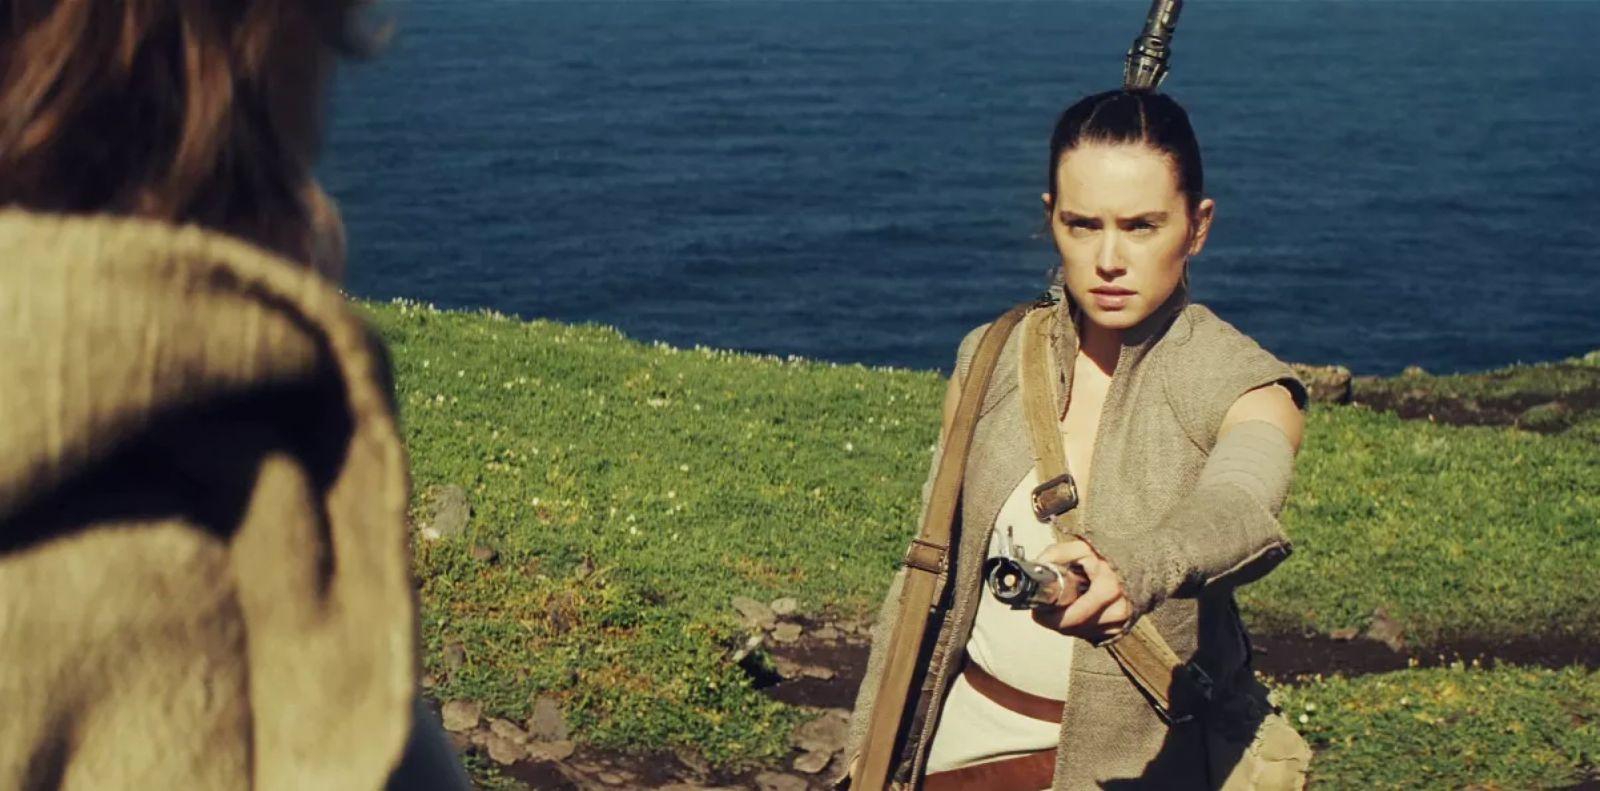 Rey in Star Wars The Force Awakens